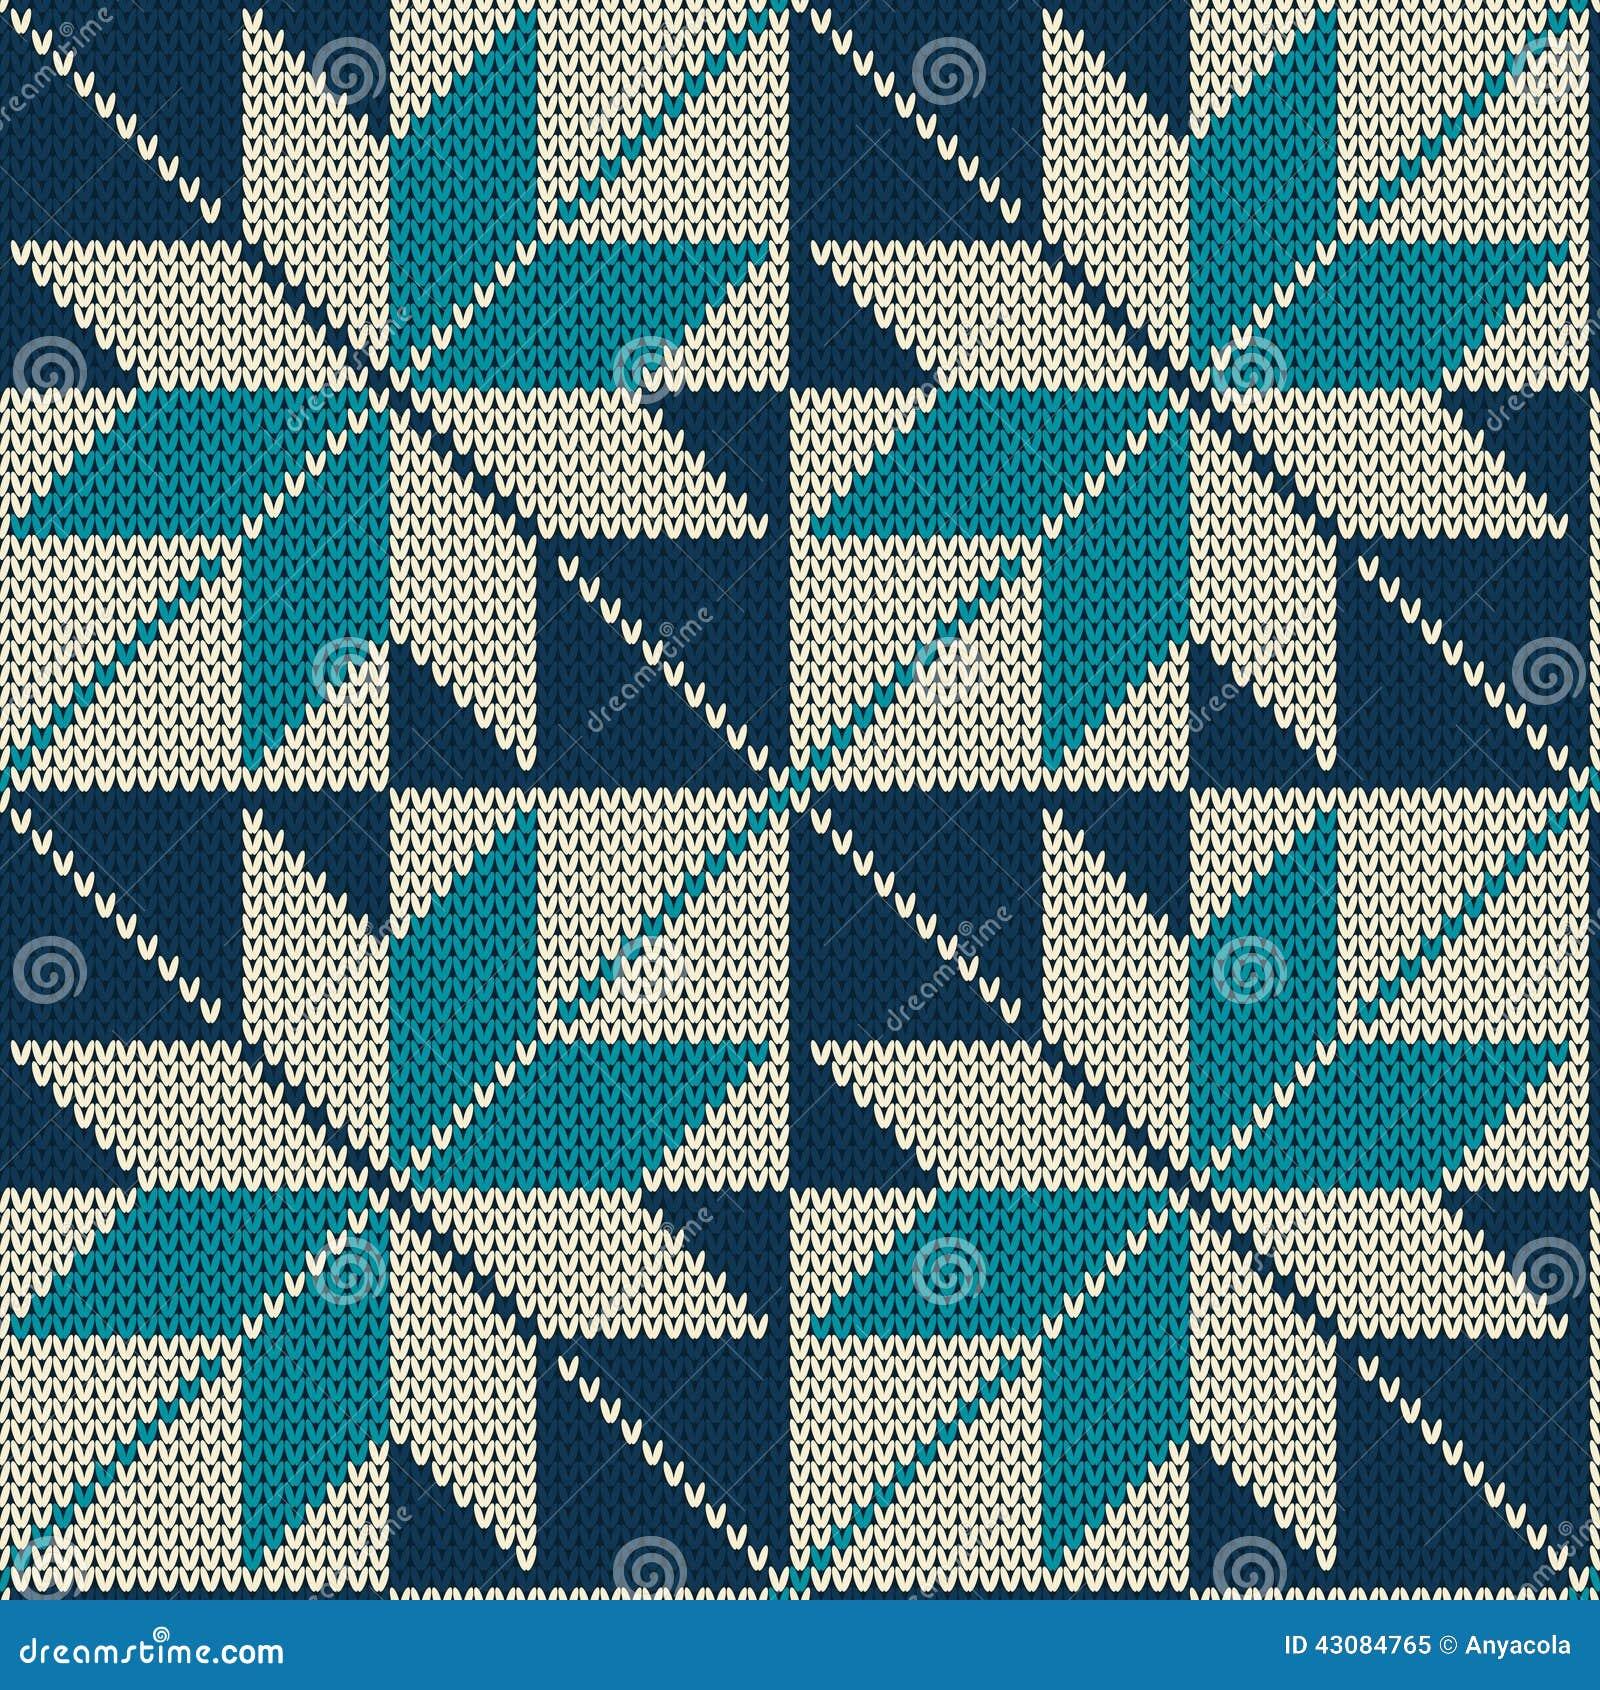 Scandinavian Style Seamless Knitted Pattern. Knitted Wool Texture ...